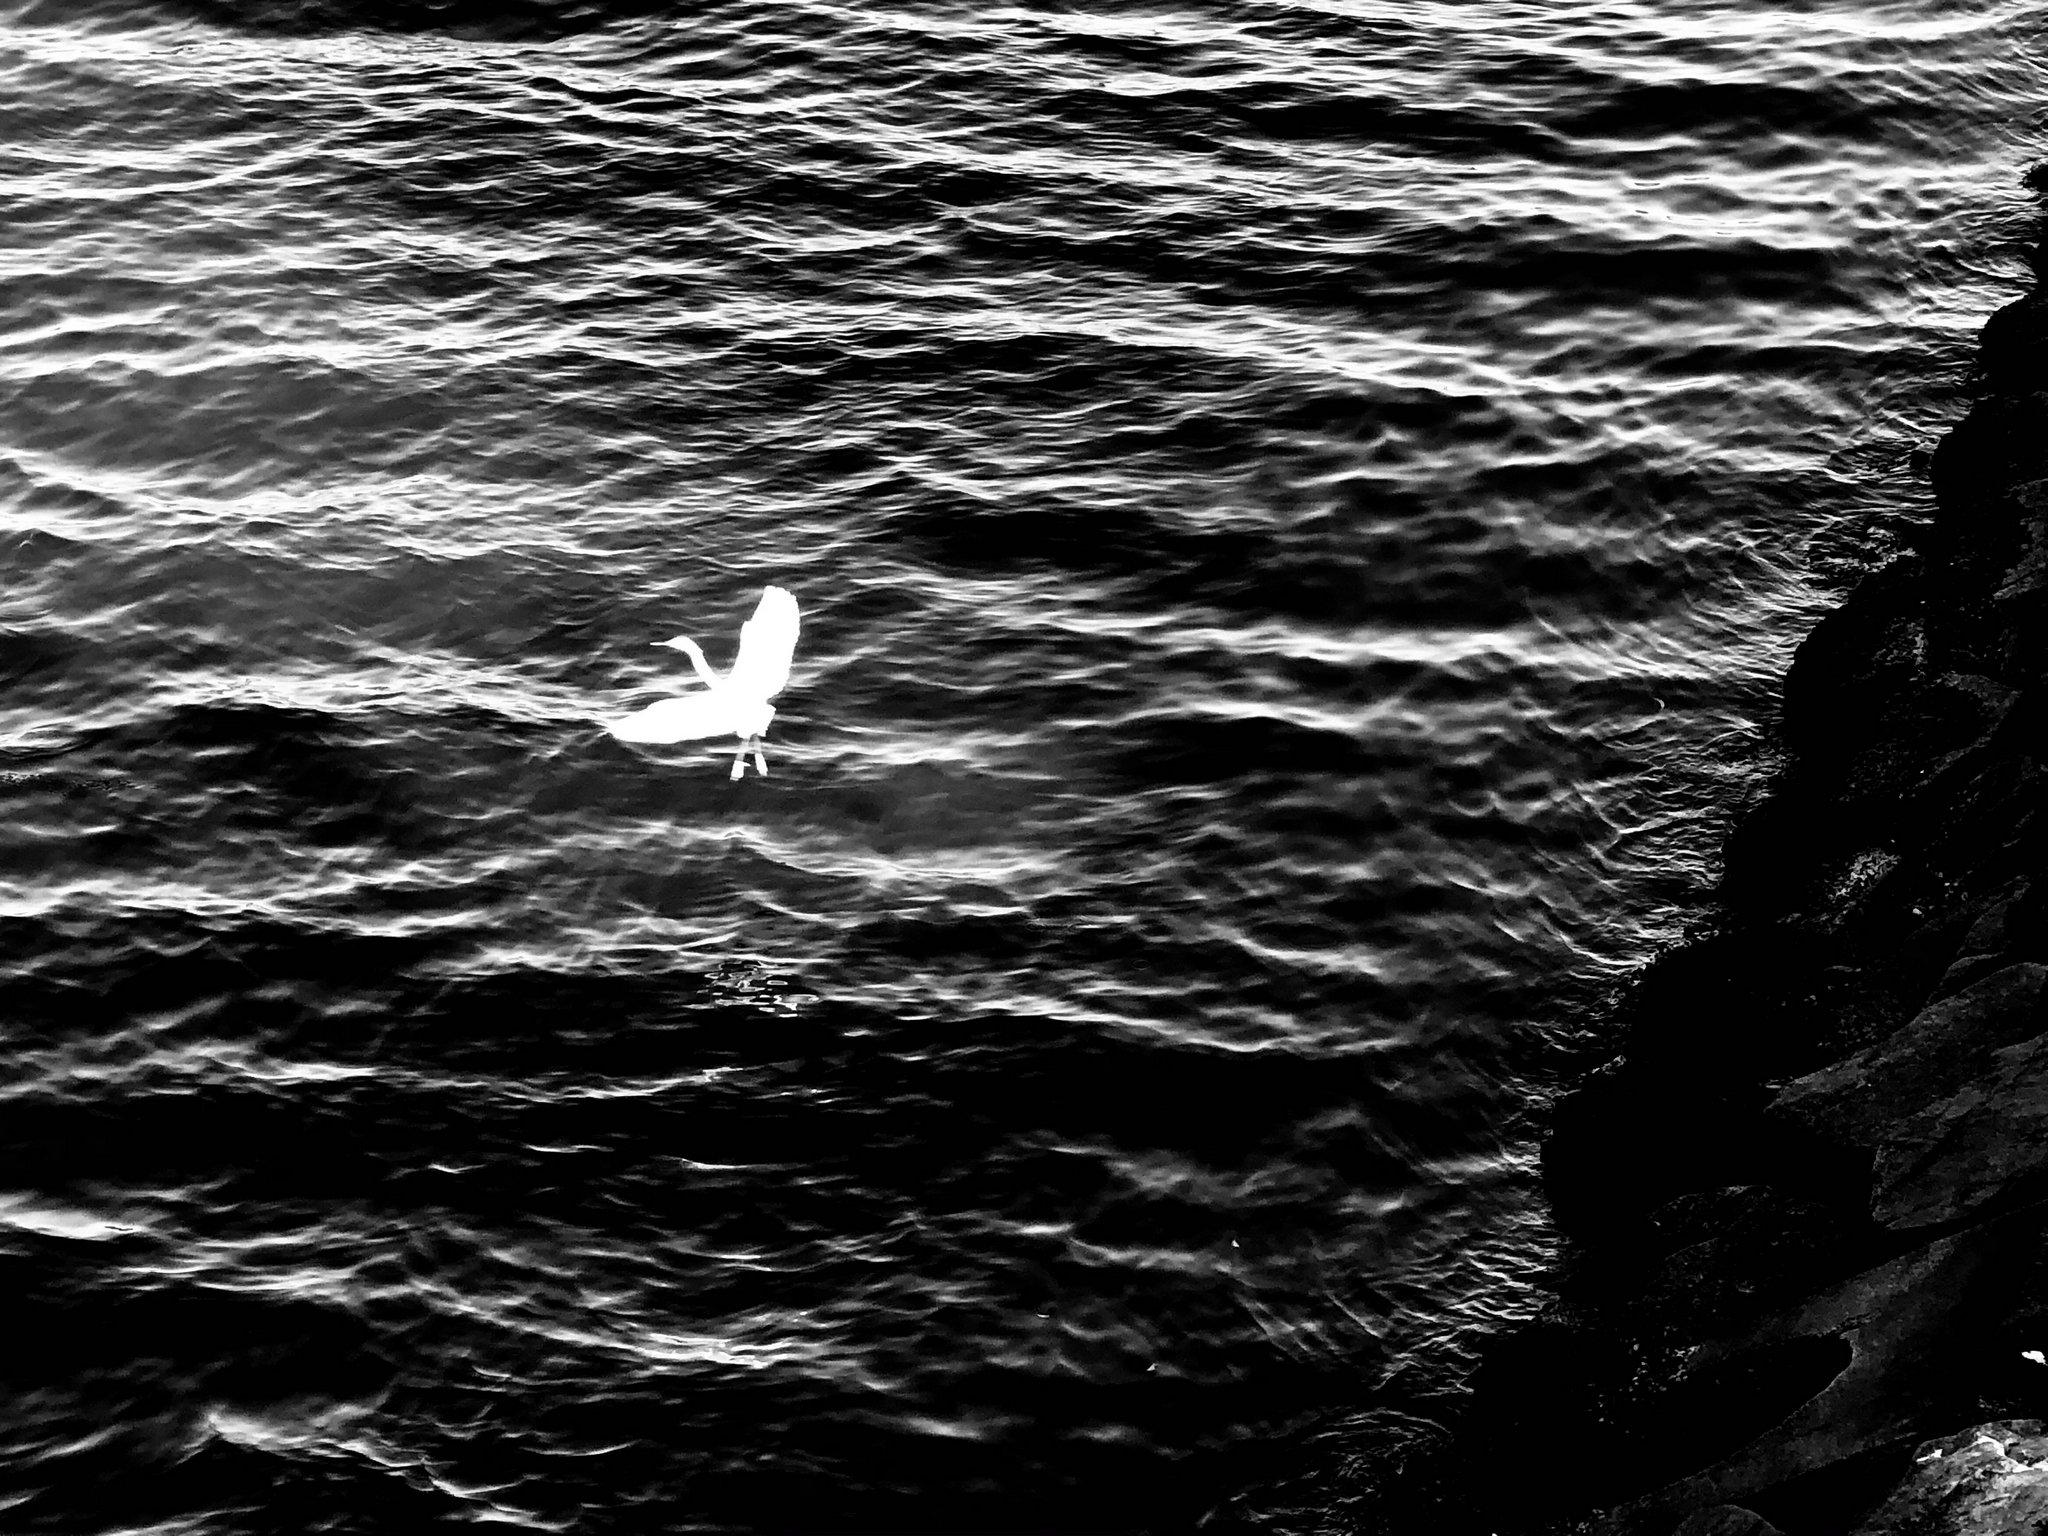 32. stork silhouette in reverse